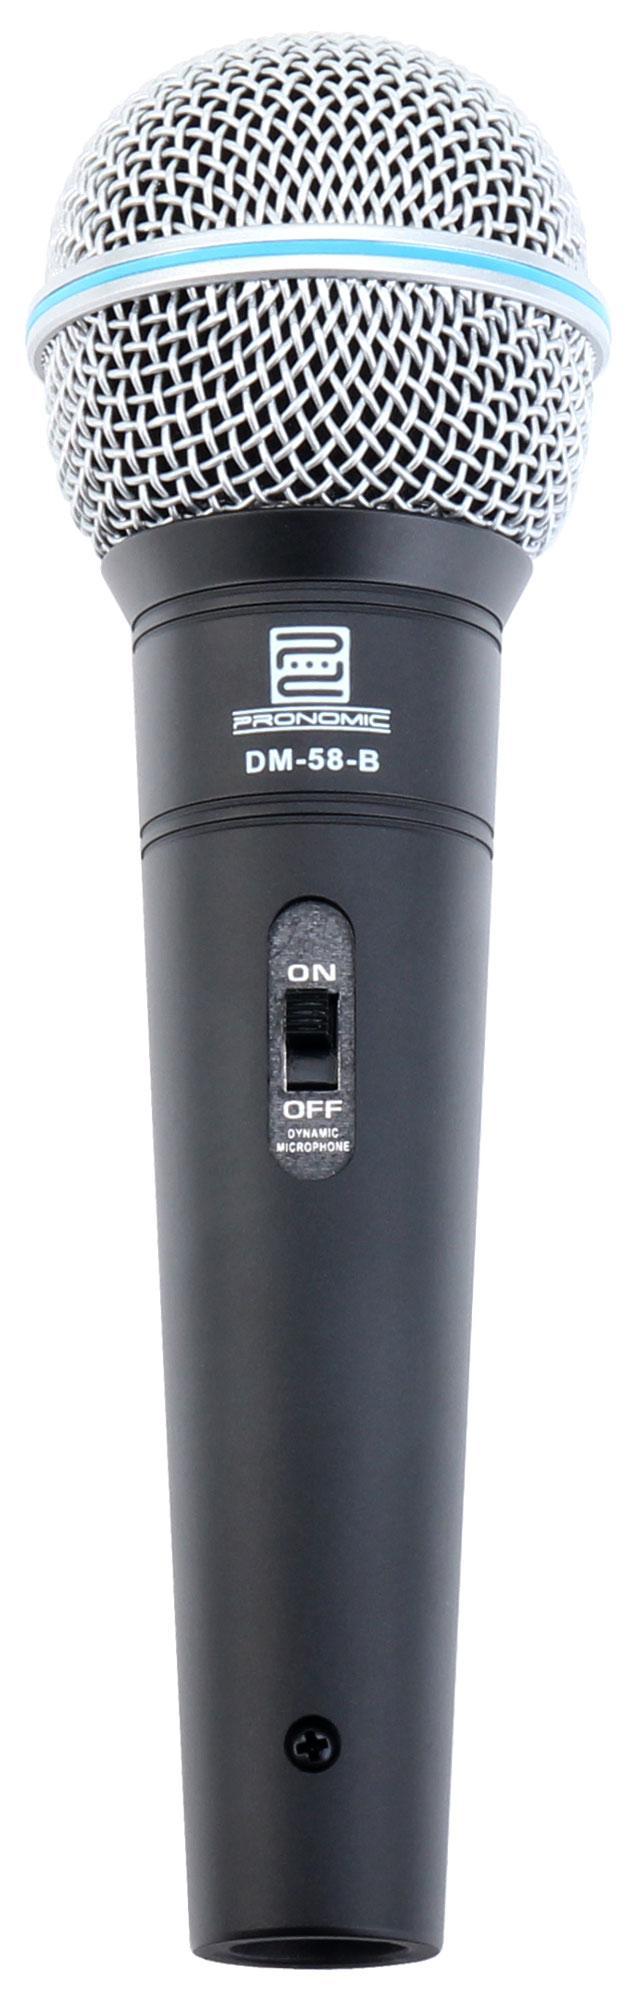 Pronomic DM 58 B Vocal Mikrofon mit Schalter Retoure (Zustand sehr gut)